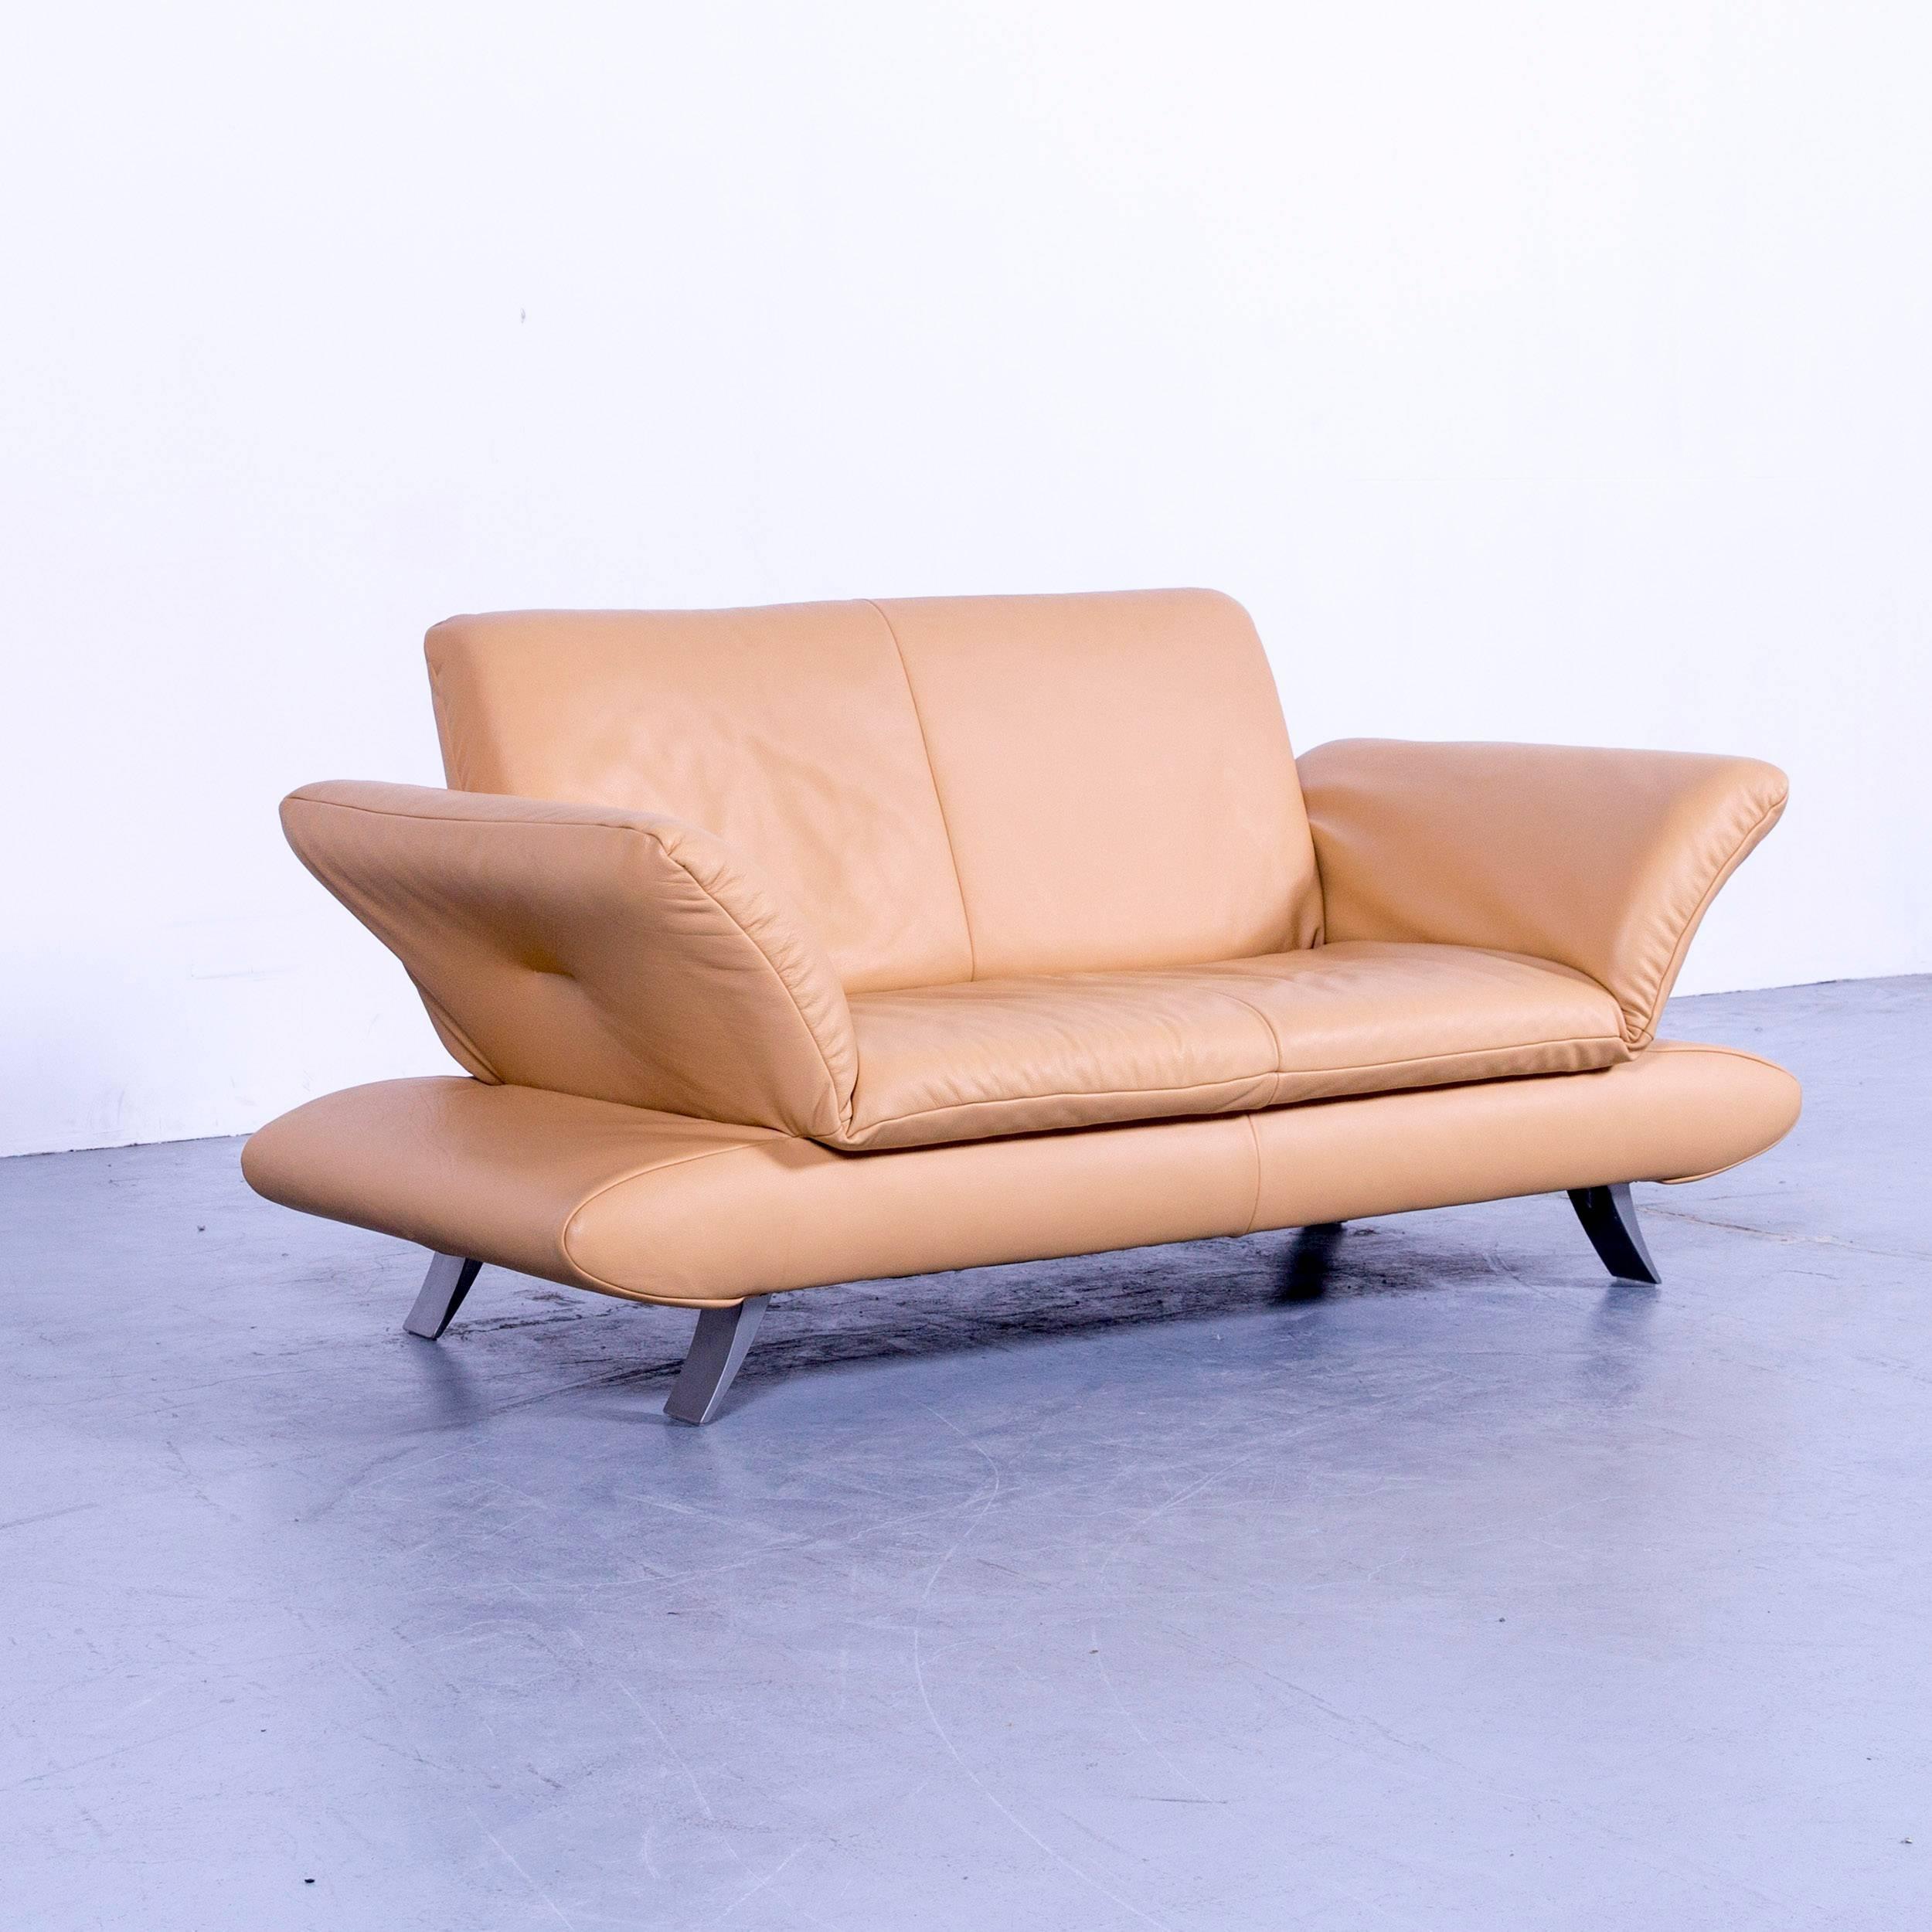 Modern Koinor Rossini Designer Two Seat Sofa Ocher Yello Beige Leather  Function For Sale